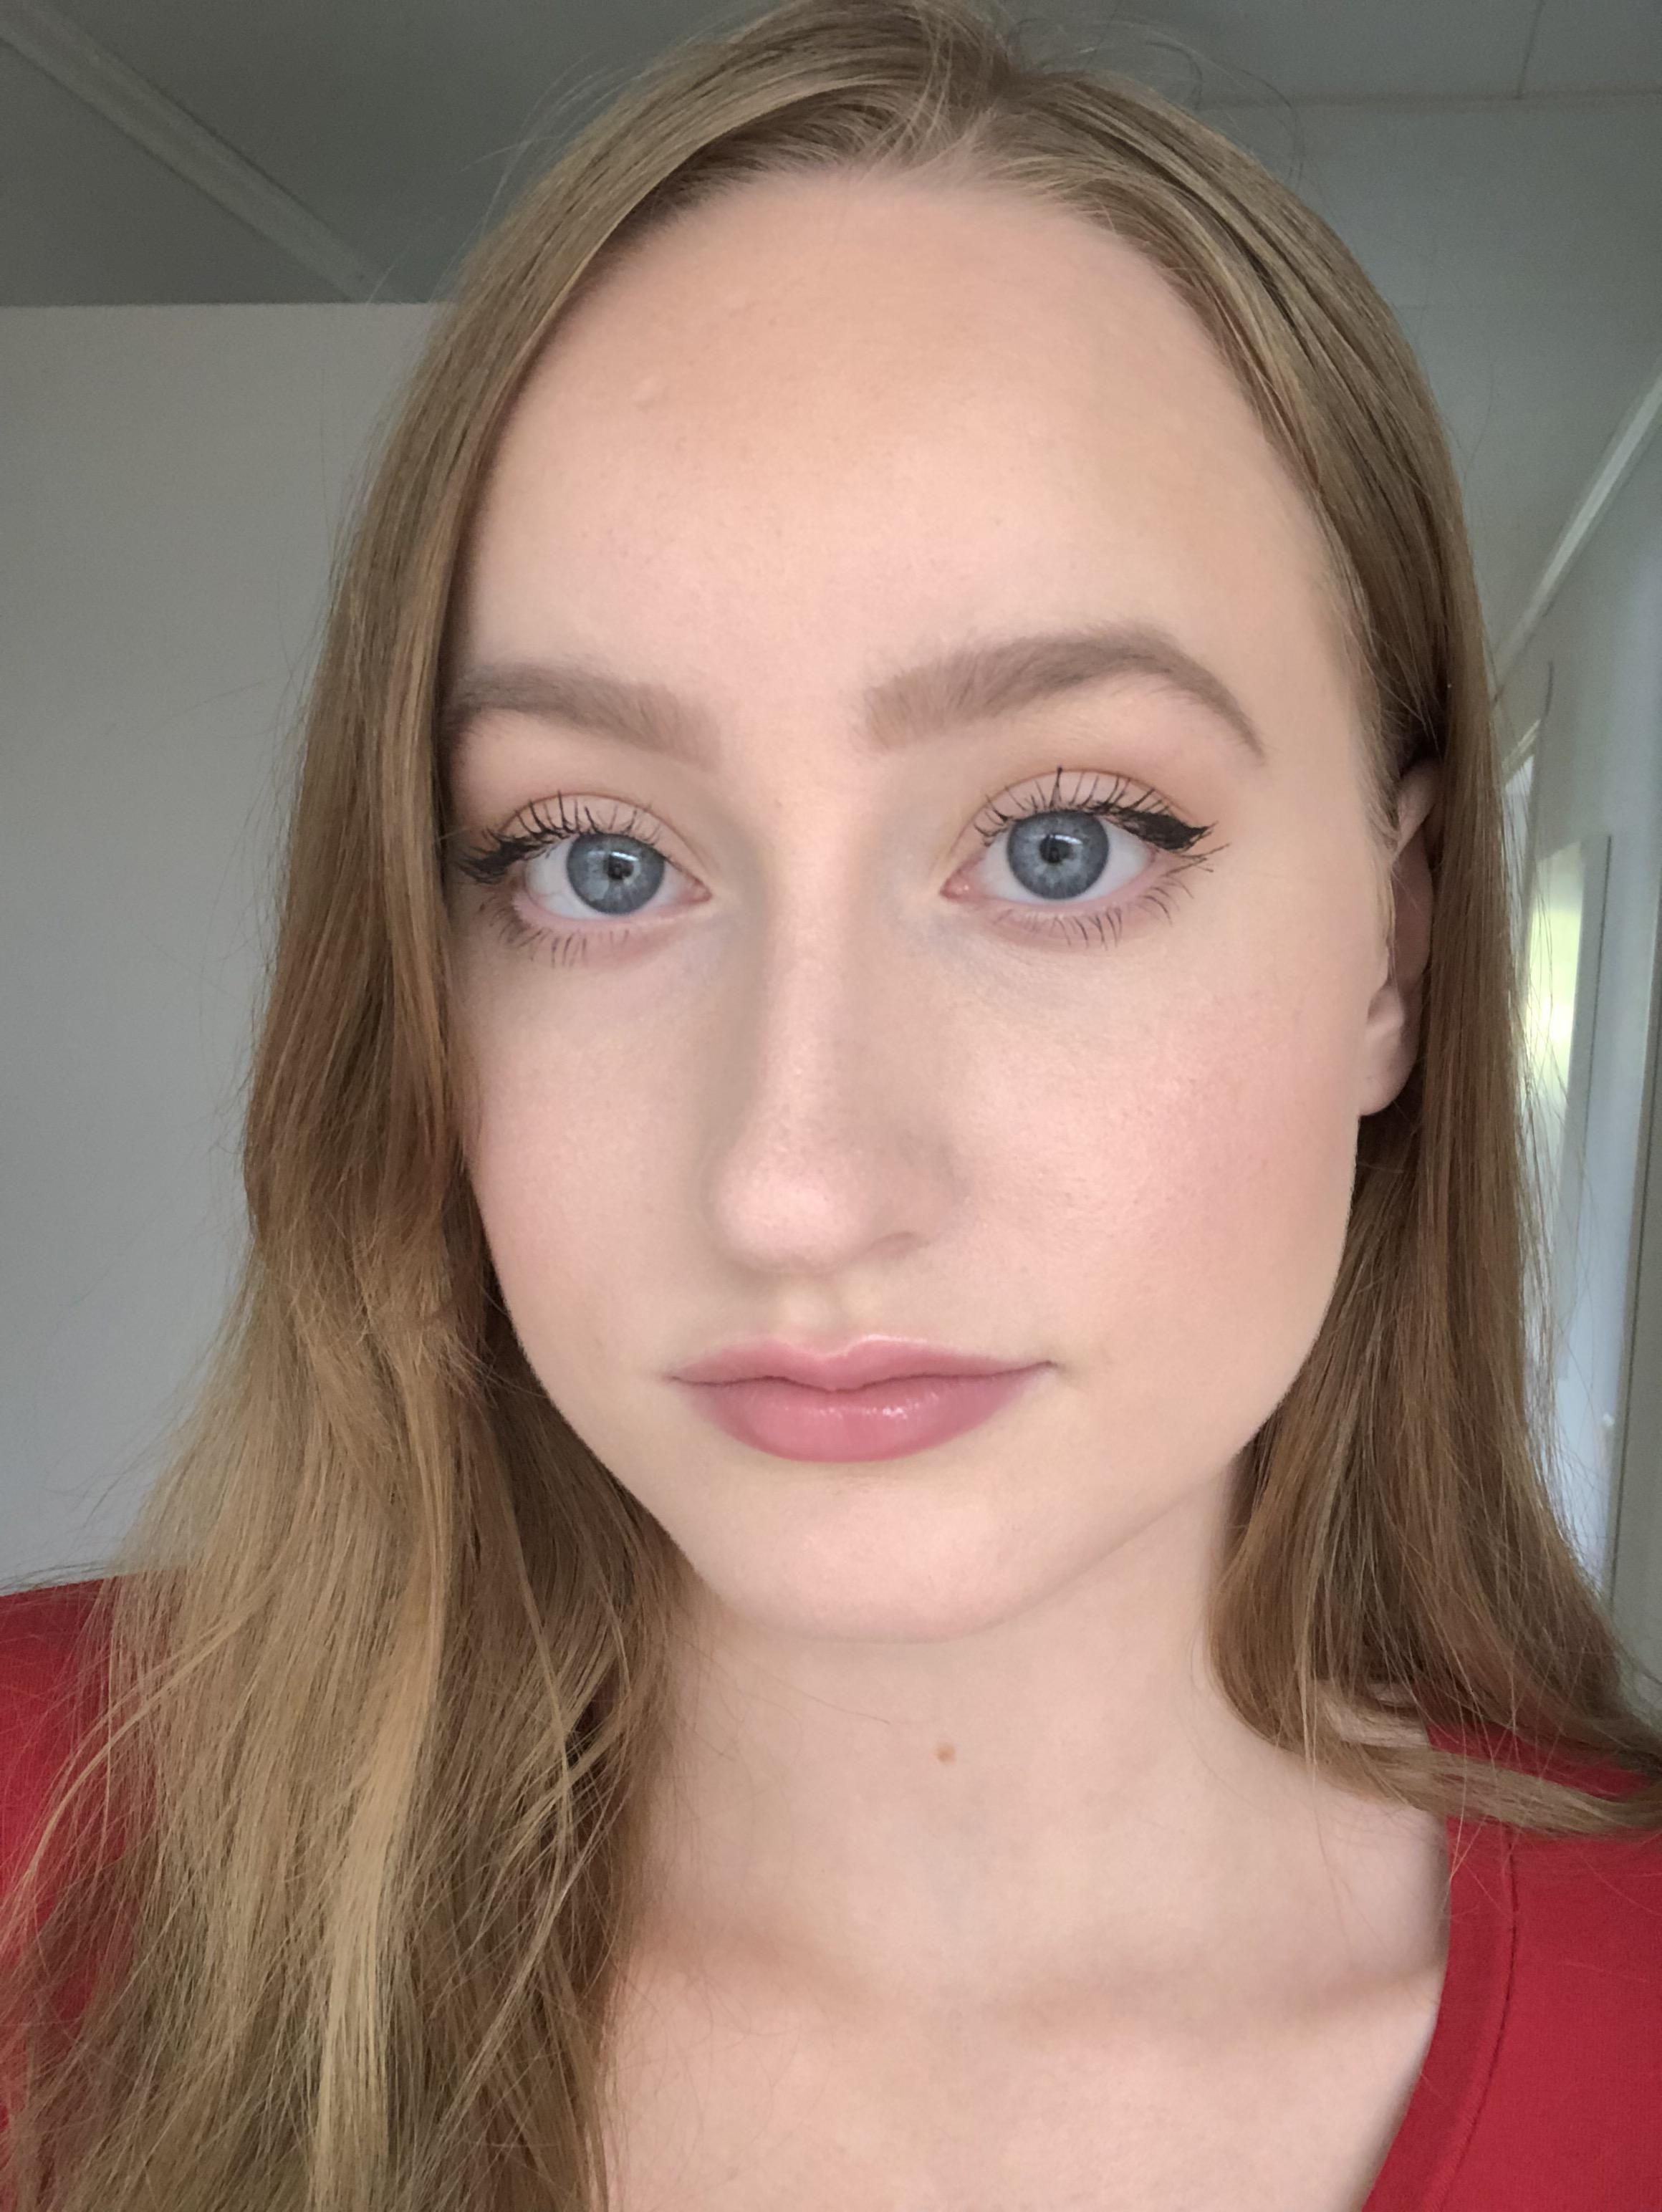 No eyeshadow eyeshadowhair haircare haircaretips